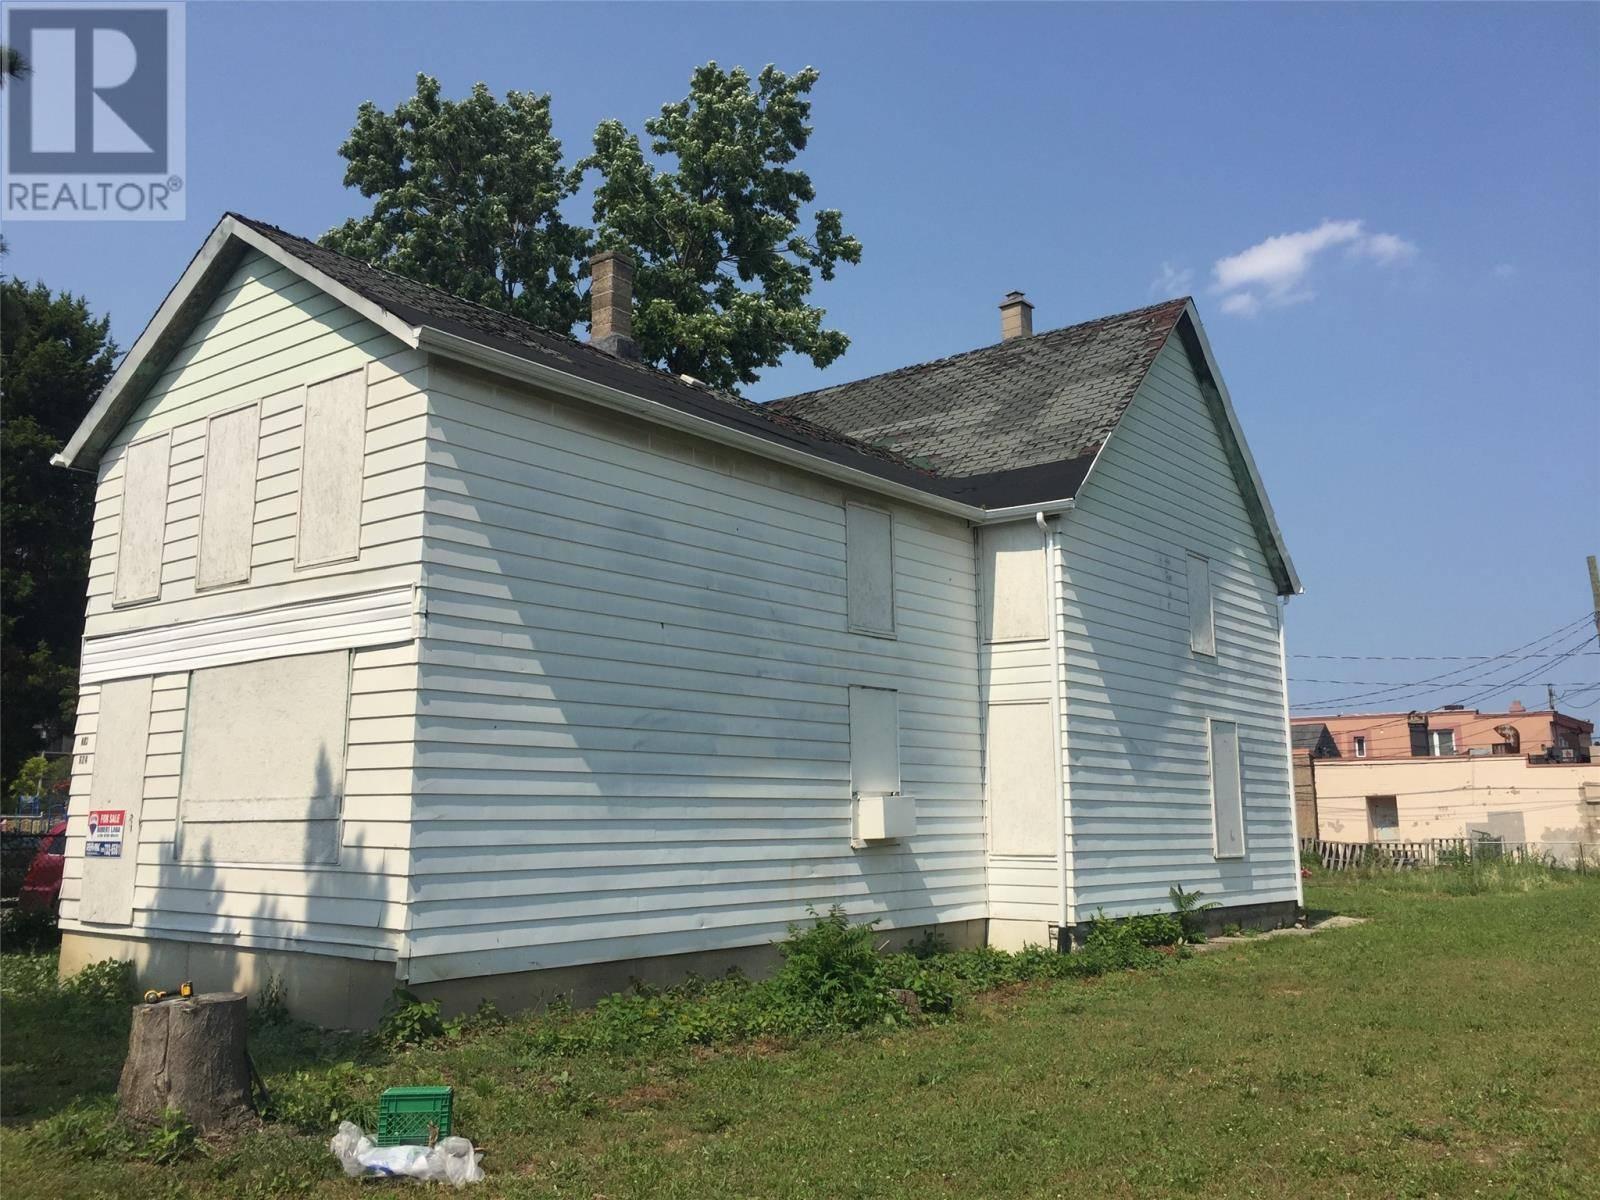 House for sale at 624 Mercer  Windsor Ontario - MLS: 19022500